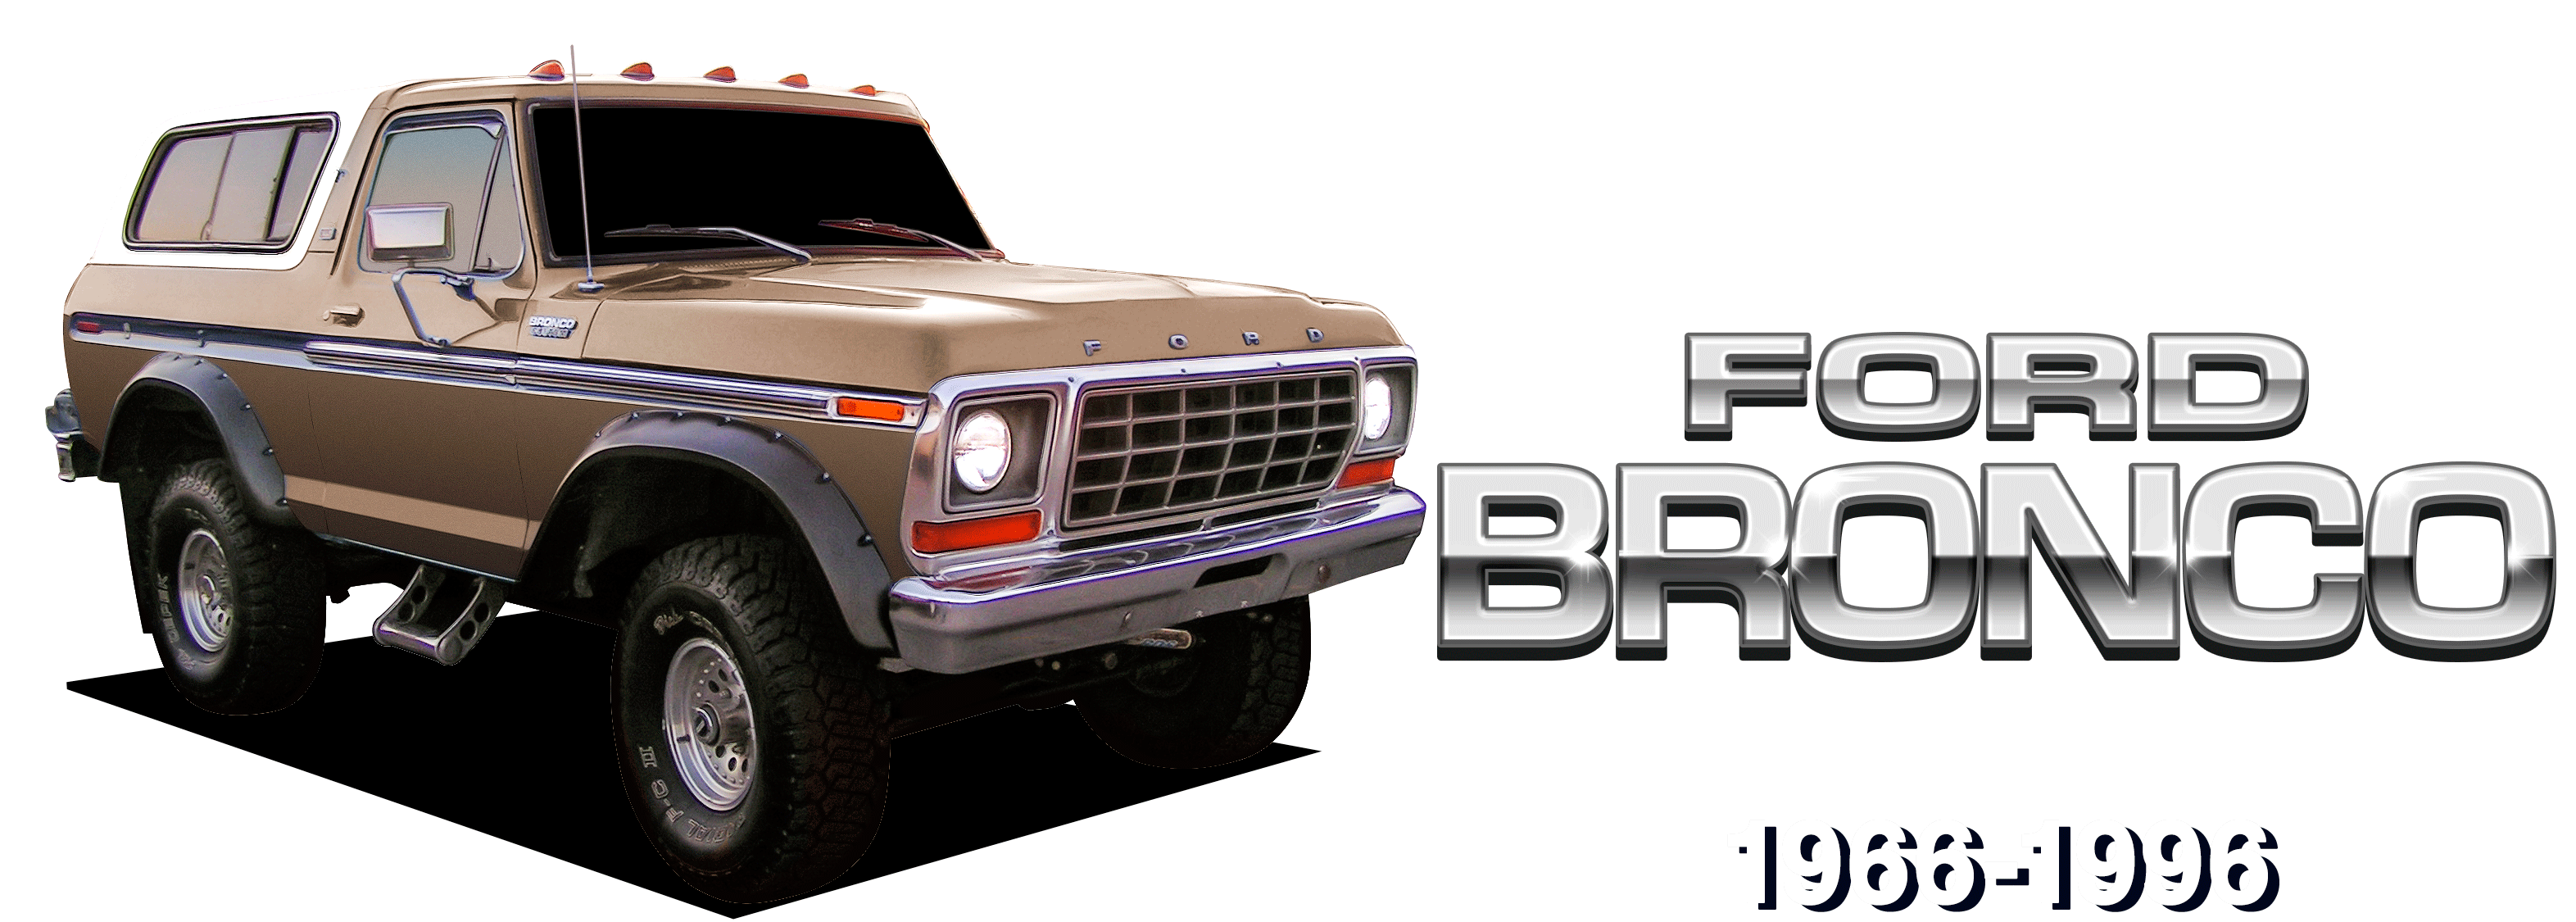 Ford-Bronco-vehicle-desktop